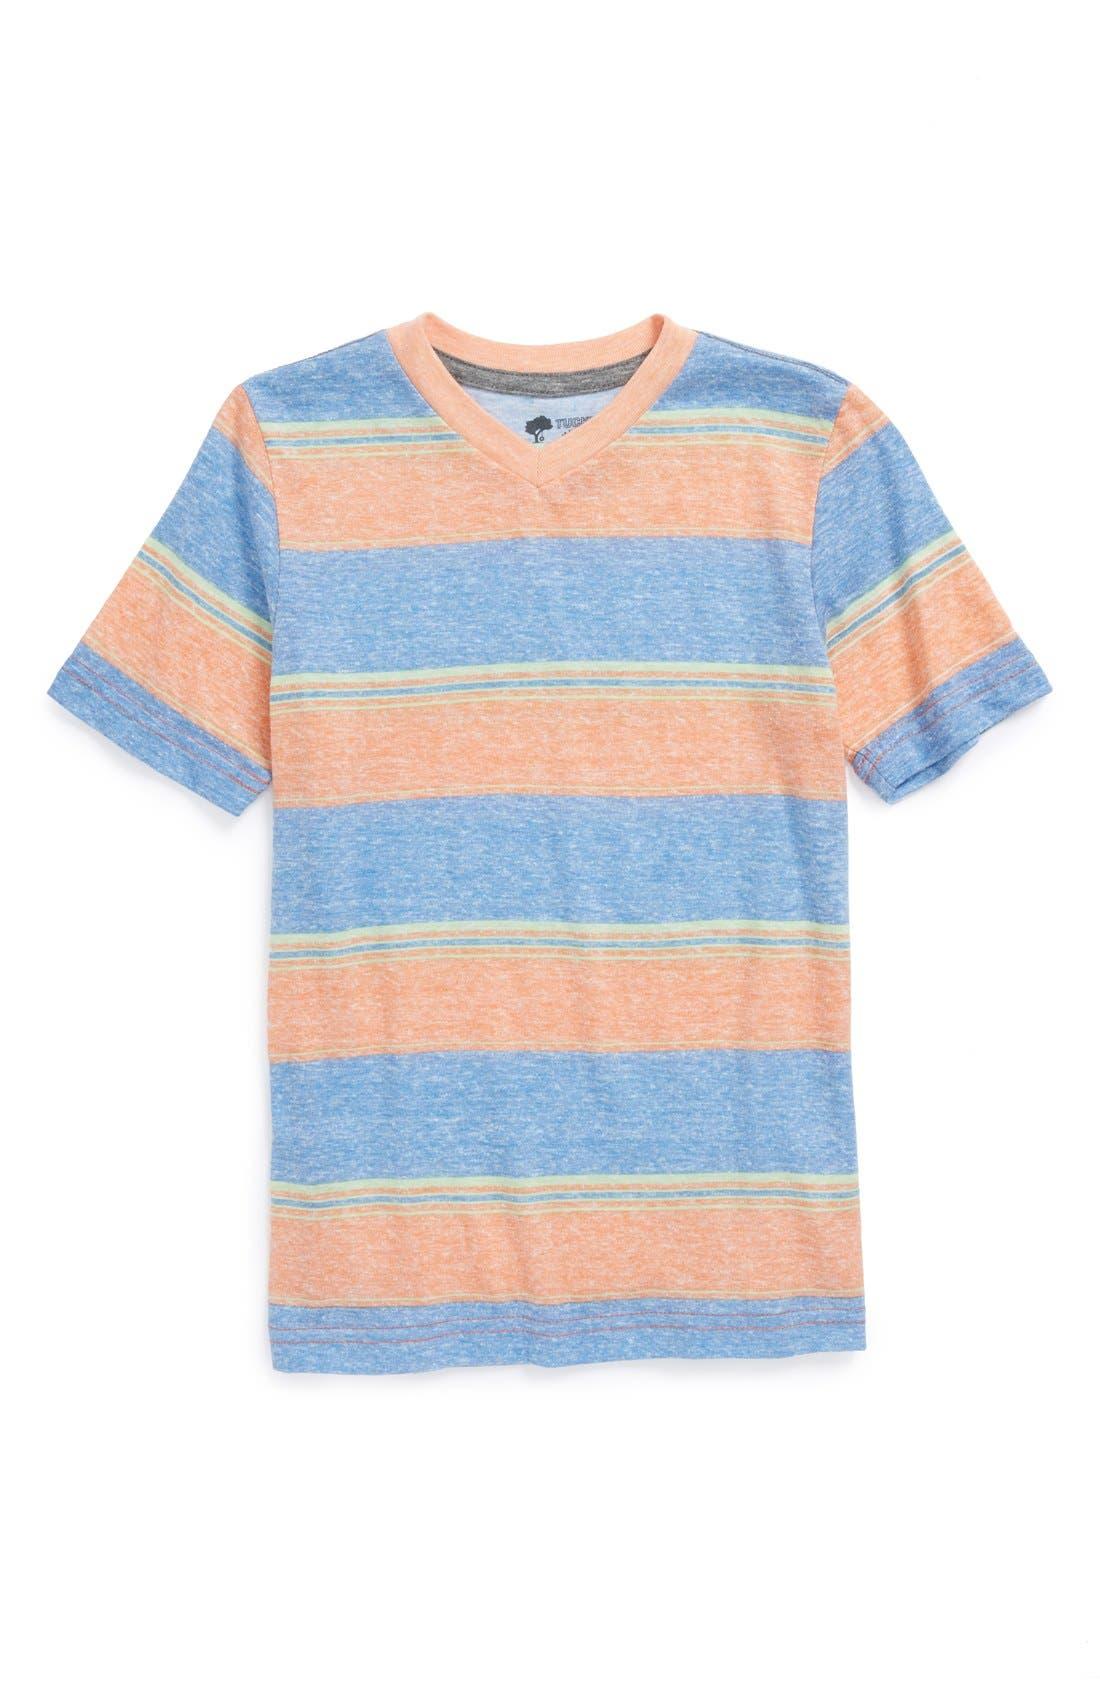 Alternate Image 1 Selected - Tucker + Tate 'Wallace' V-Neck T-Shirt (Toddler Boys)